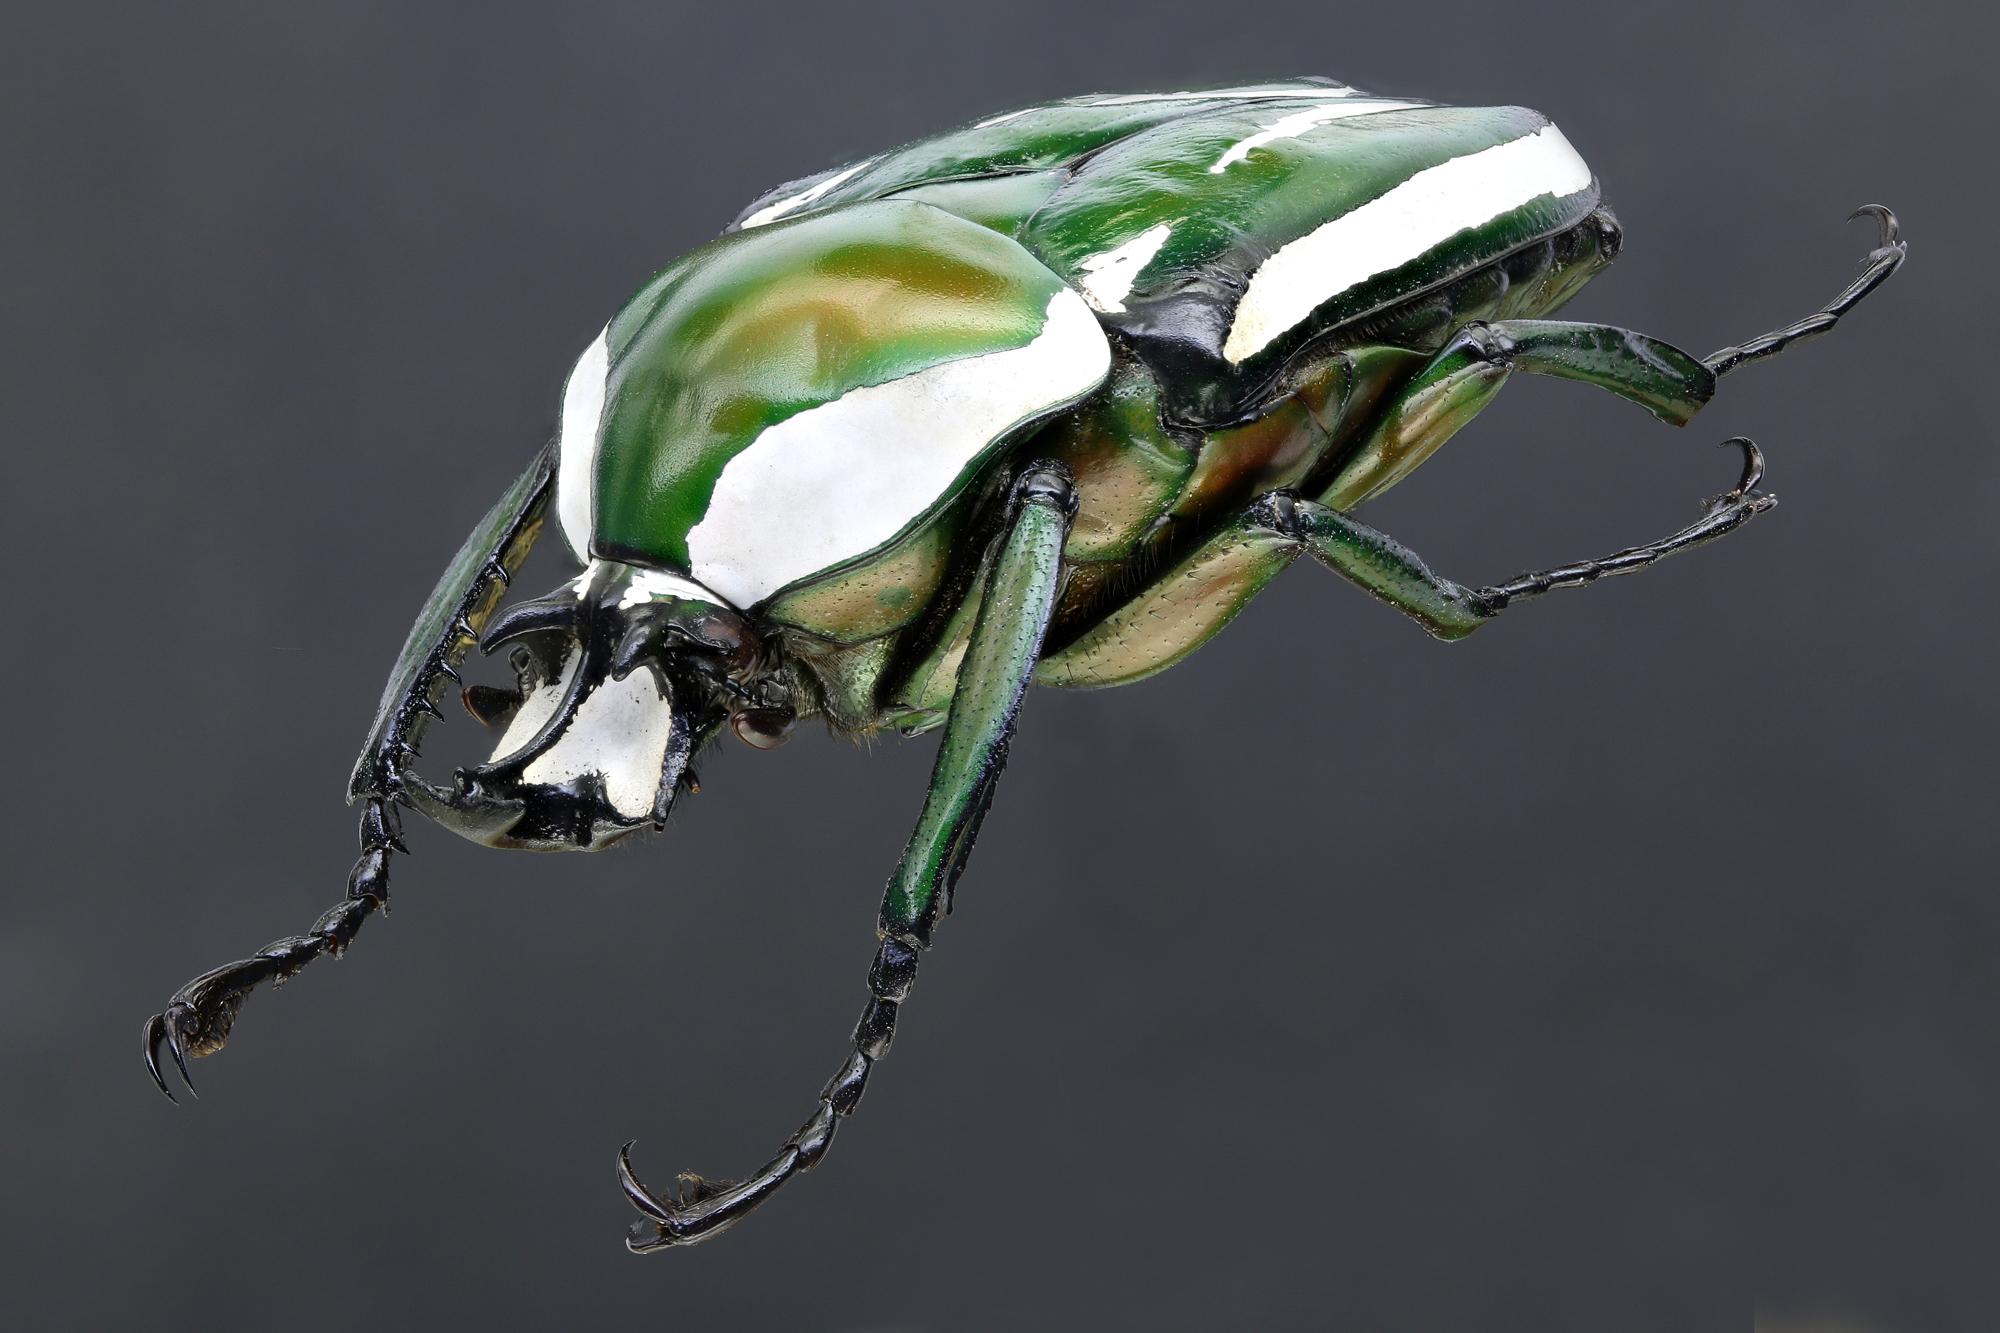 Dicronorhina derbyana layardi 66154zs72.jpg